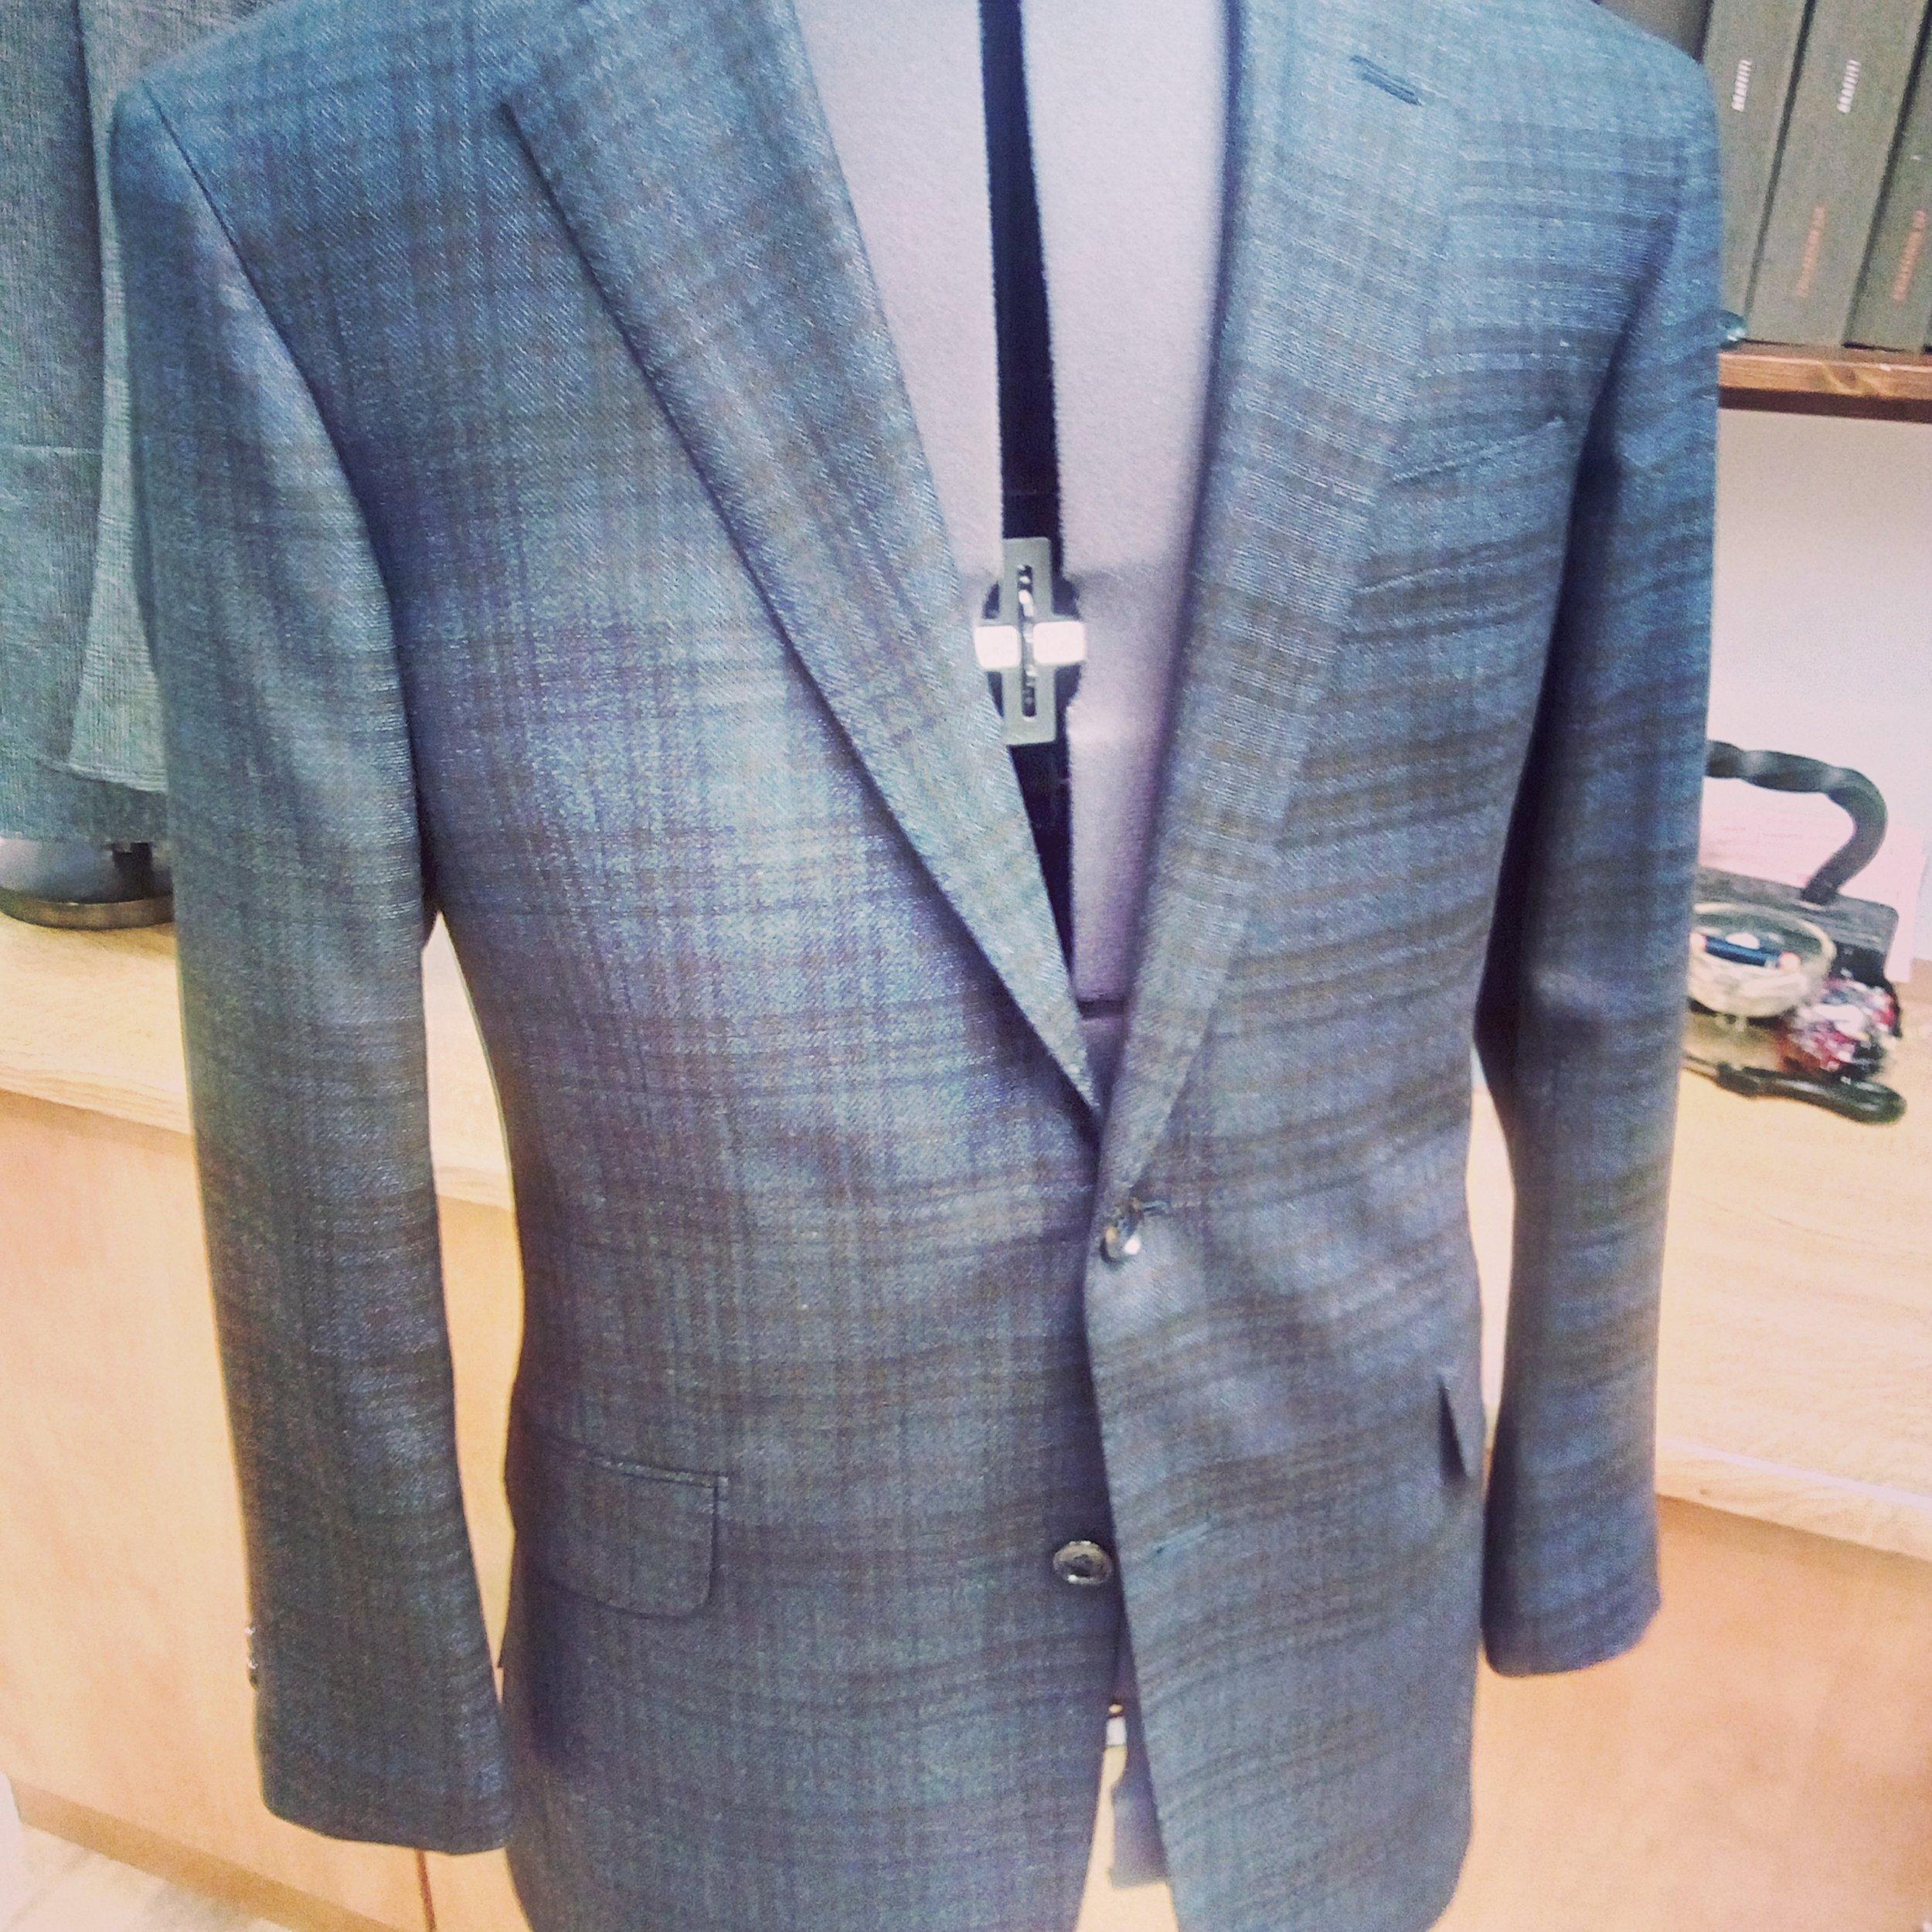 Scotts Di Pray Jacket - Wool Blend Italian Jacketing